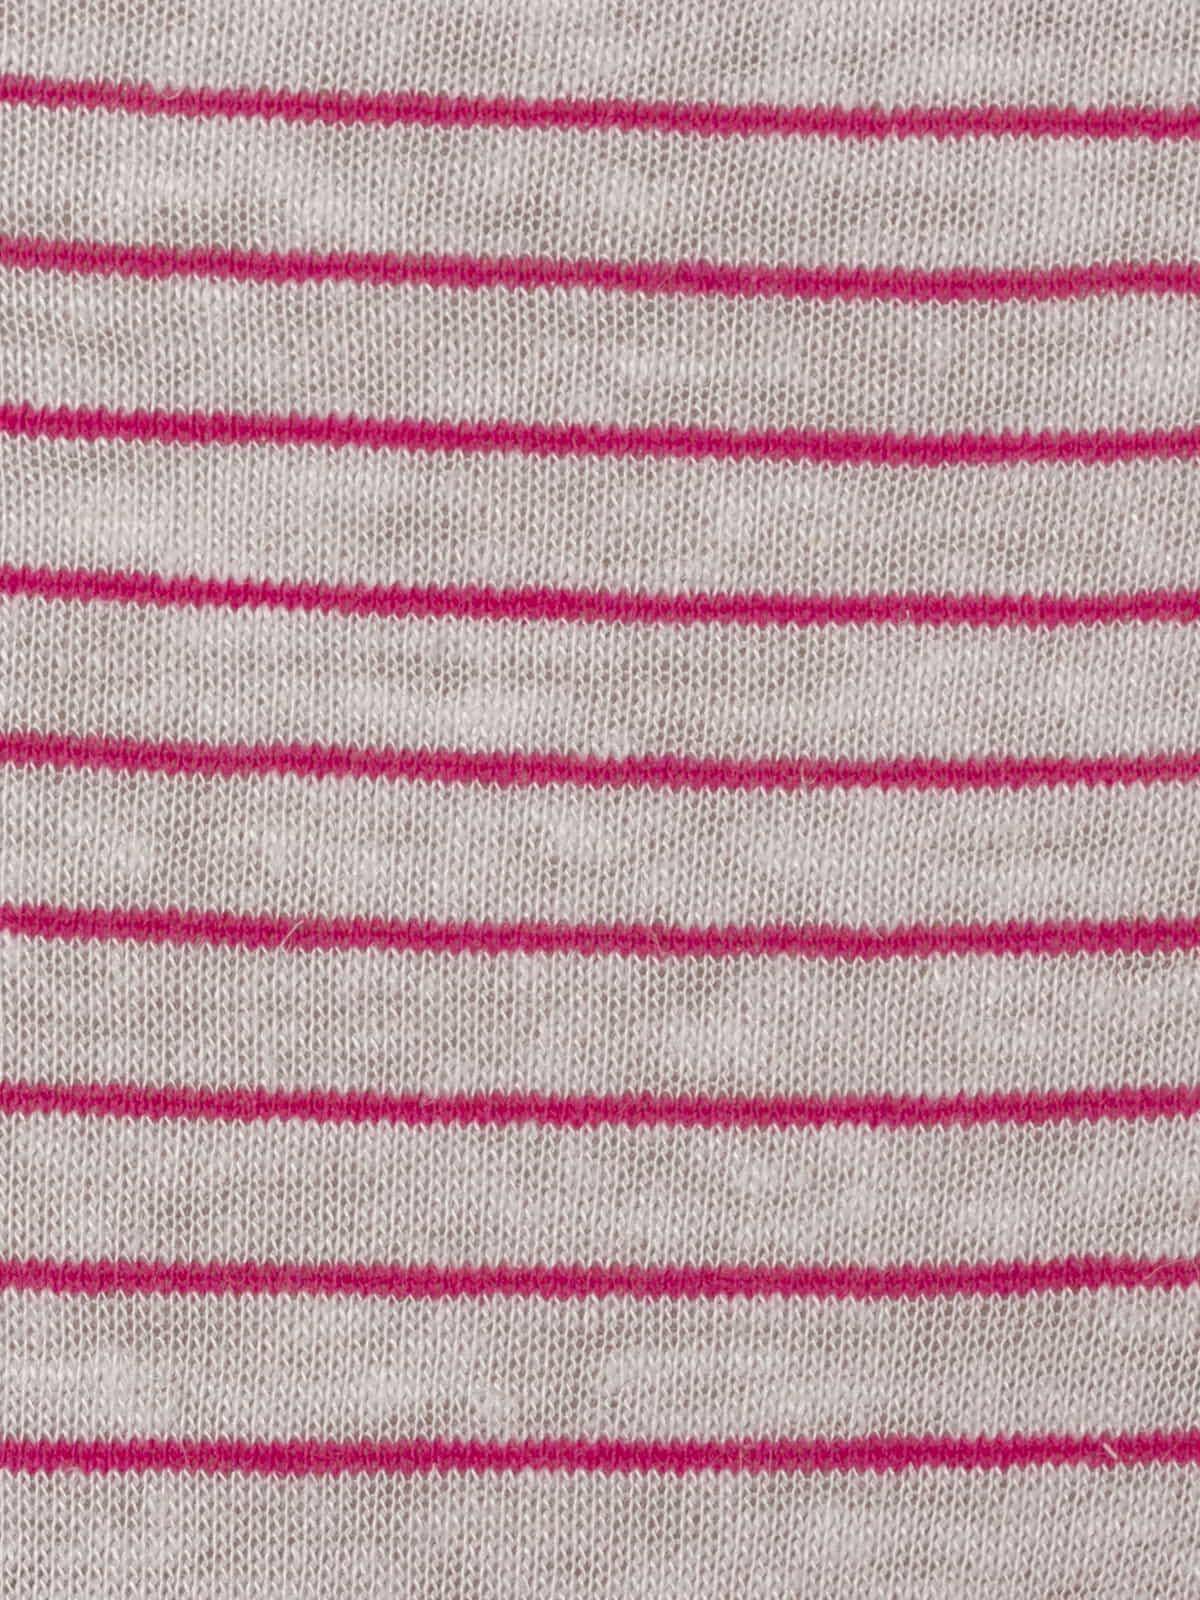 Camiseta mujer especial rayas cuello pico Fucsia